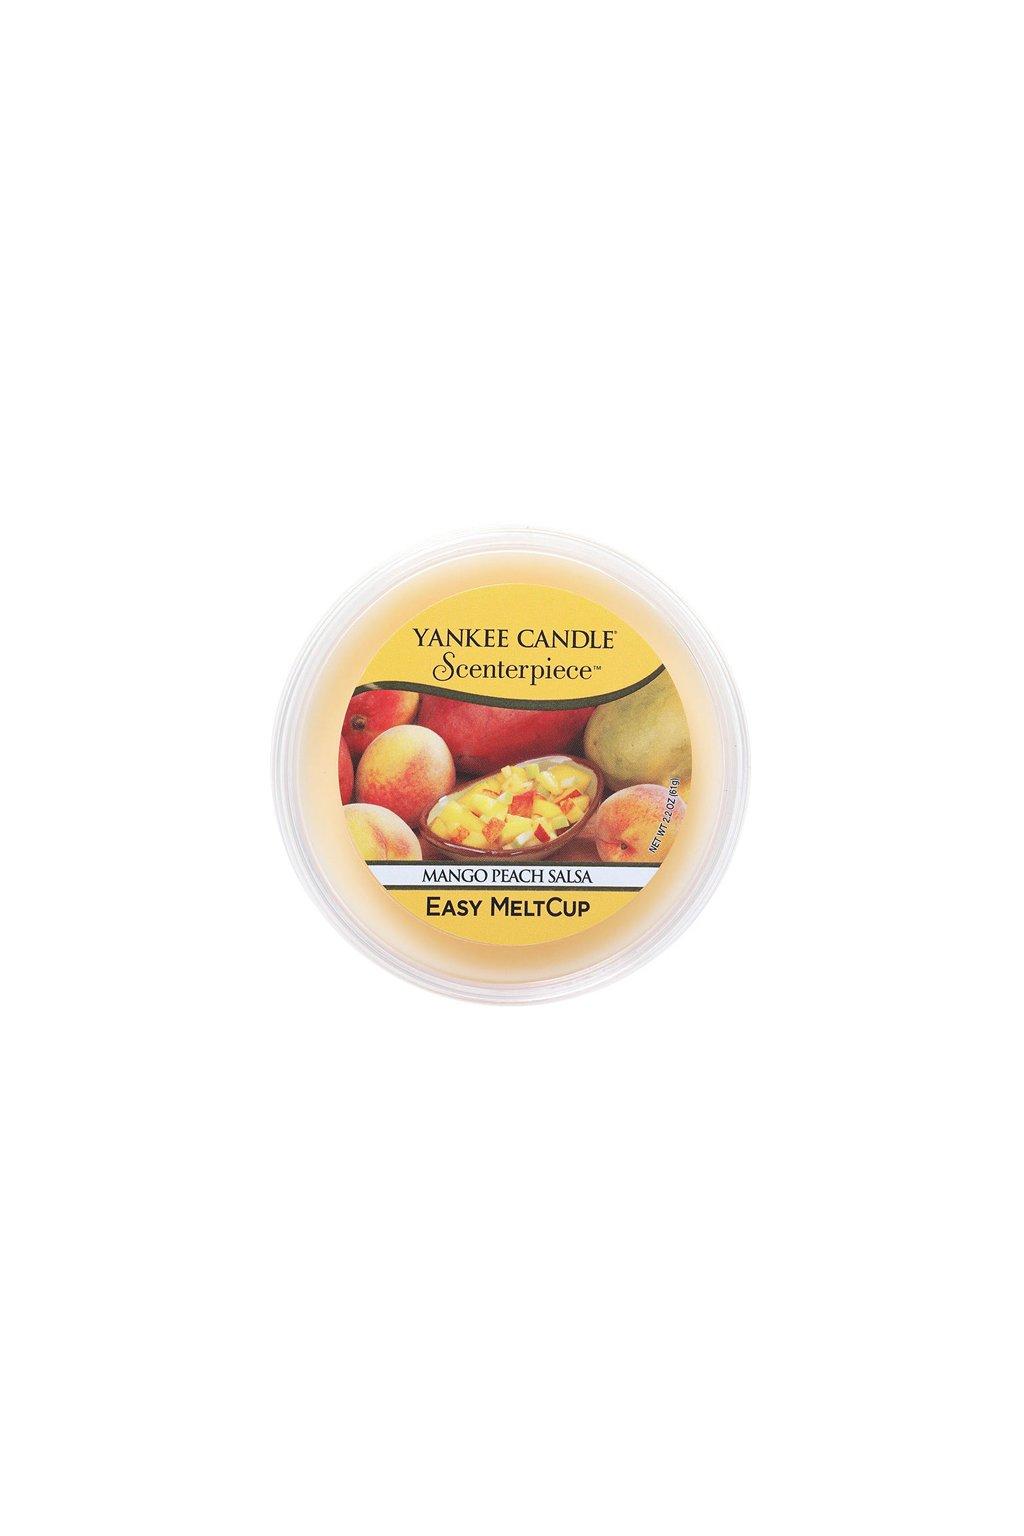 Yankee Canle Scenterpiece Meltcup Vosk Mango Peach Salsa